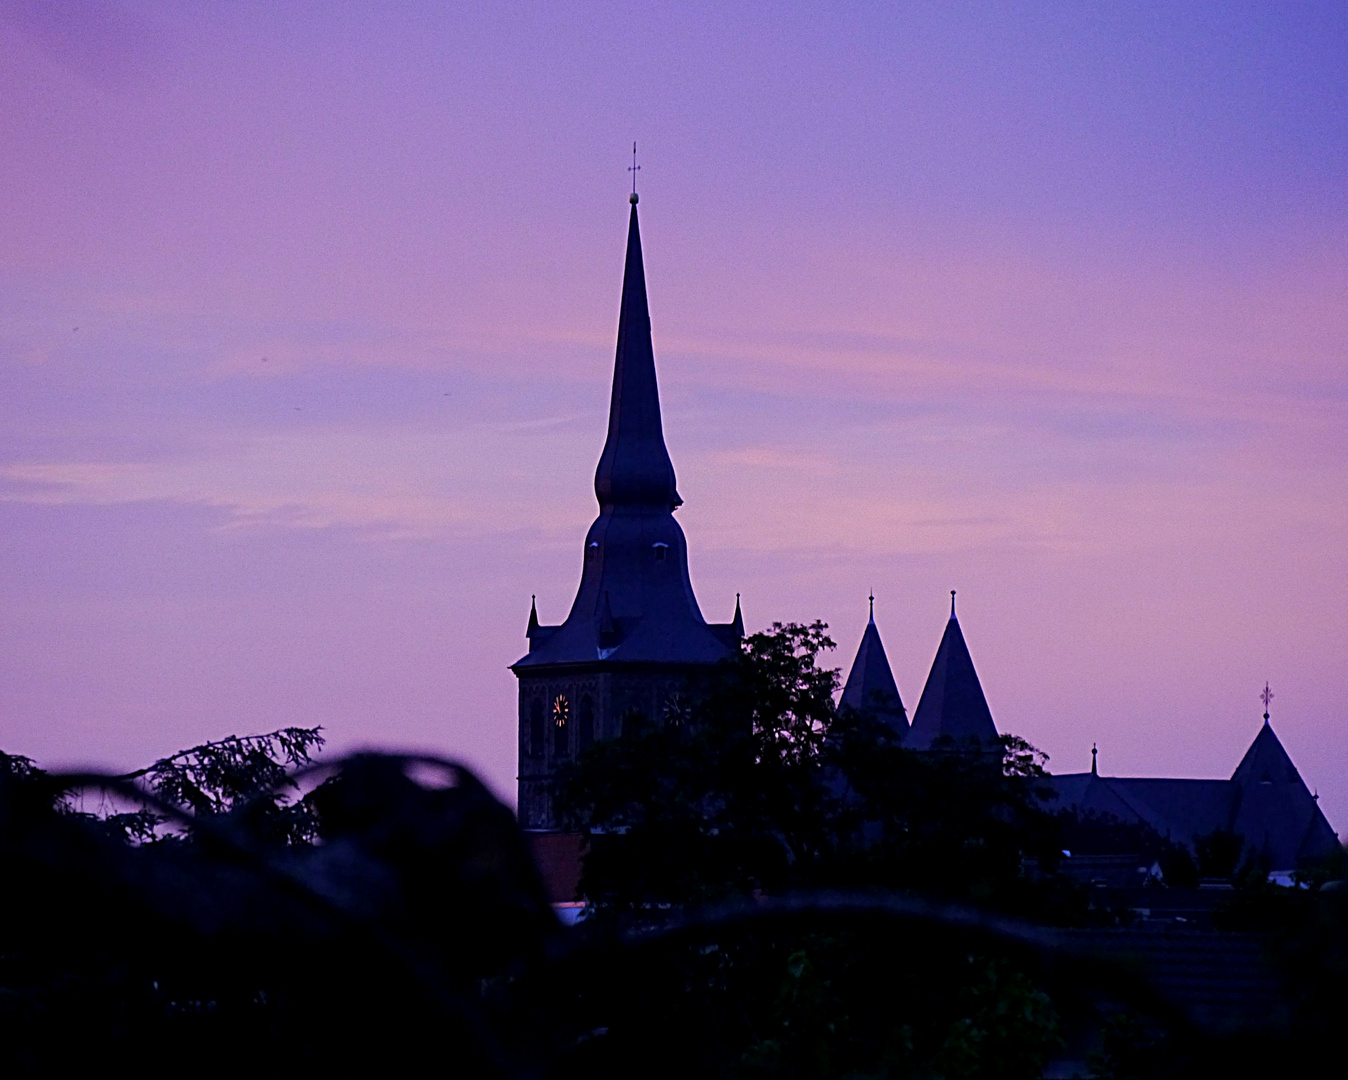 Blaue Stunde? St. Peter und Paul, Ratingen.